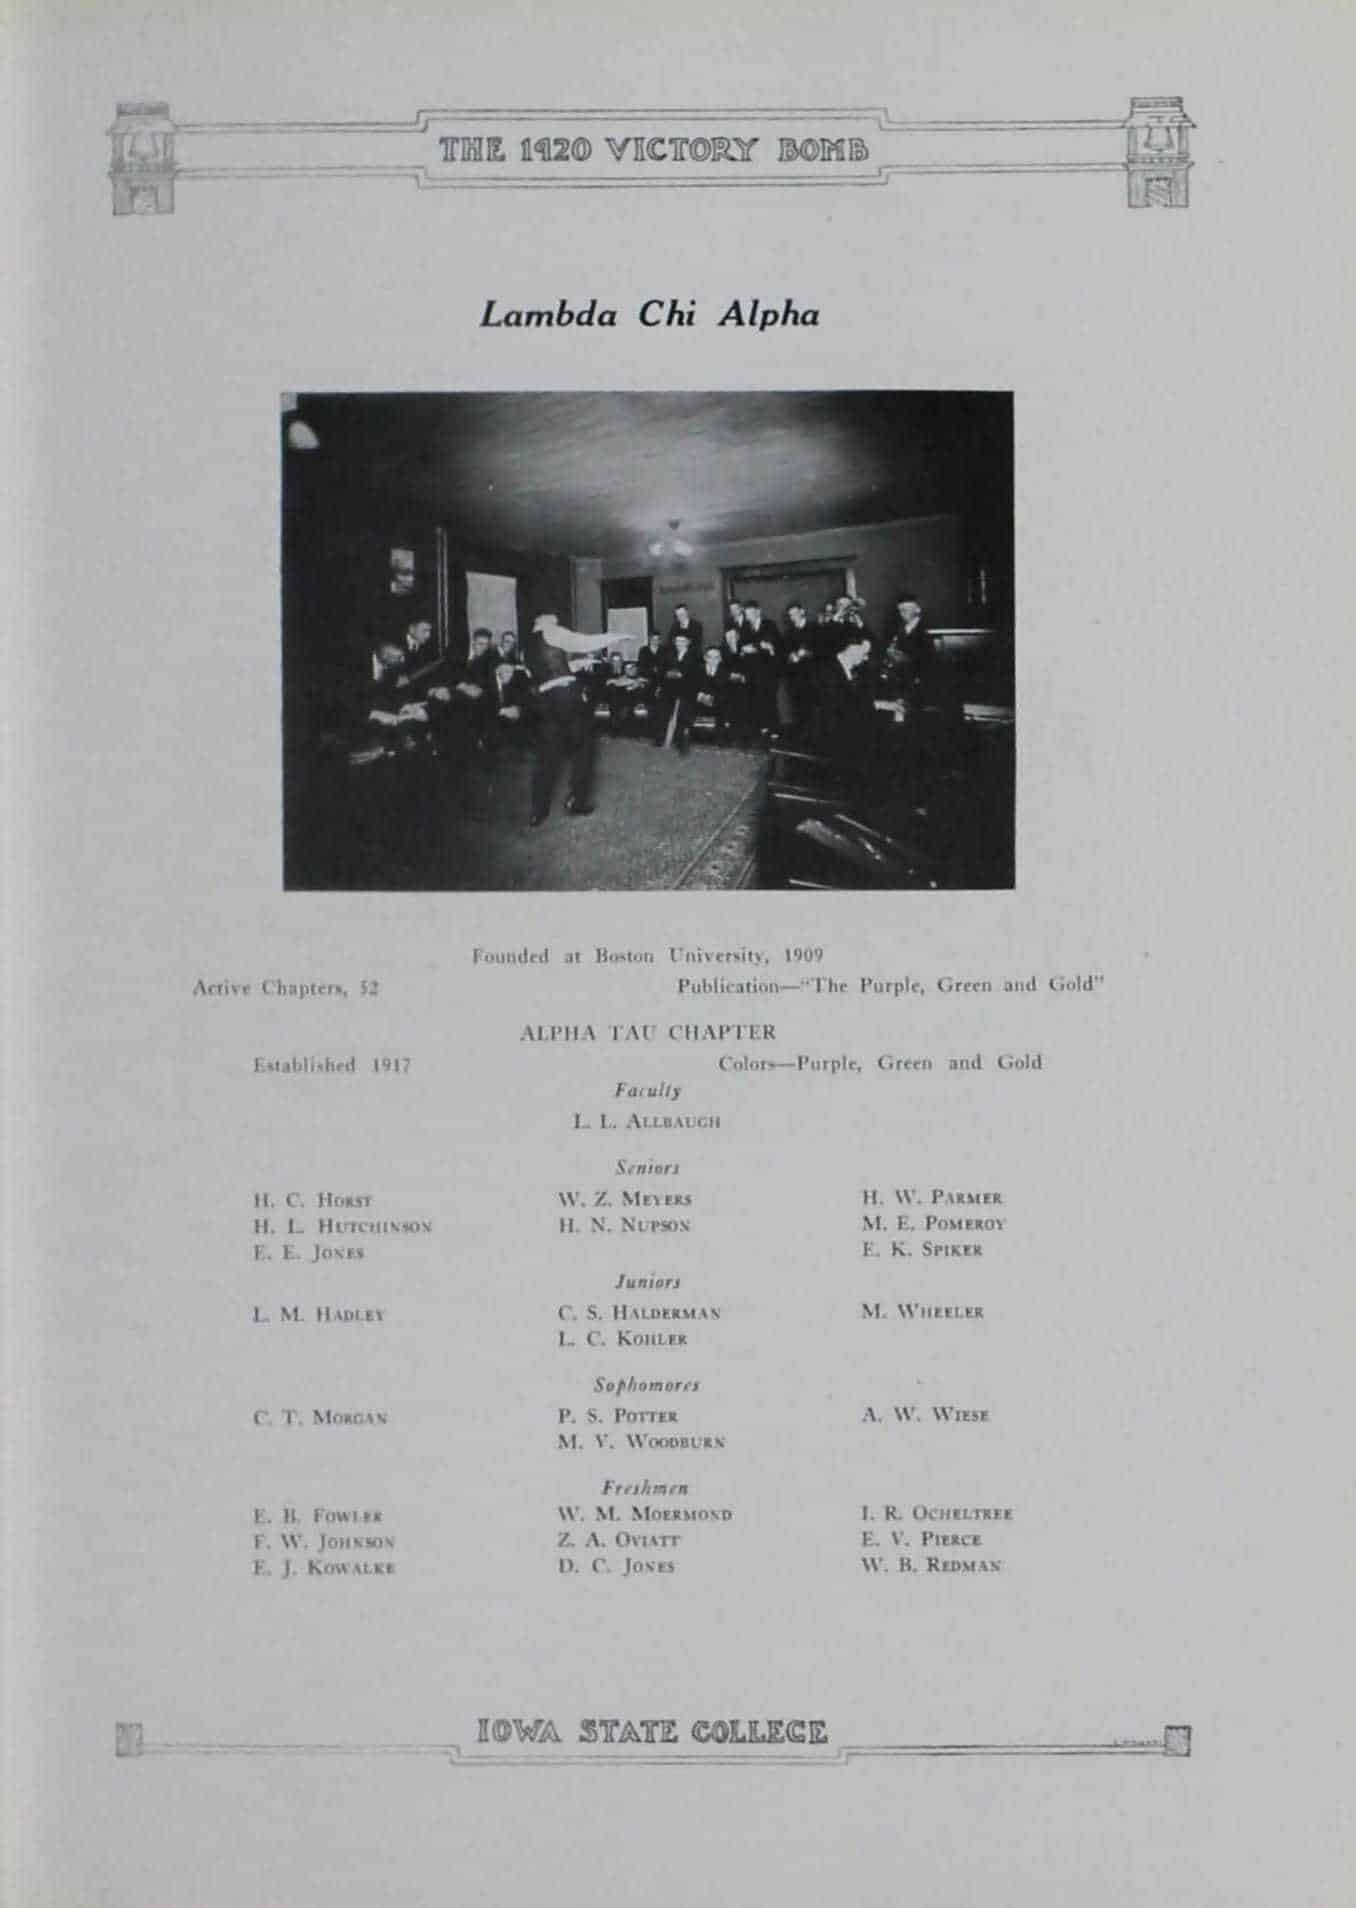 1919 Lambda Chi Alpha Roster